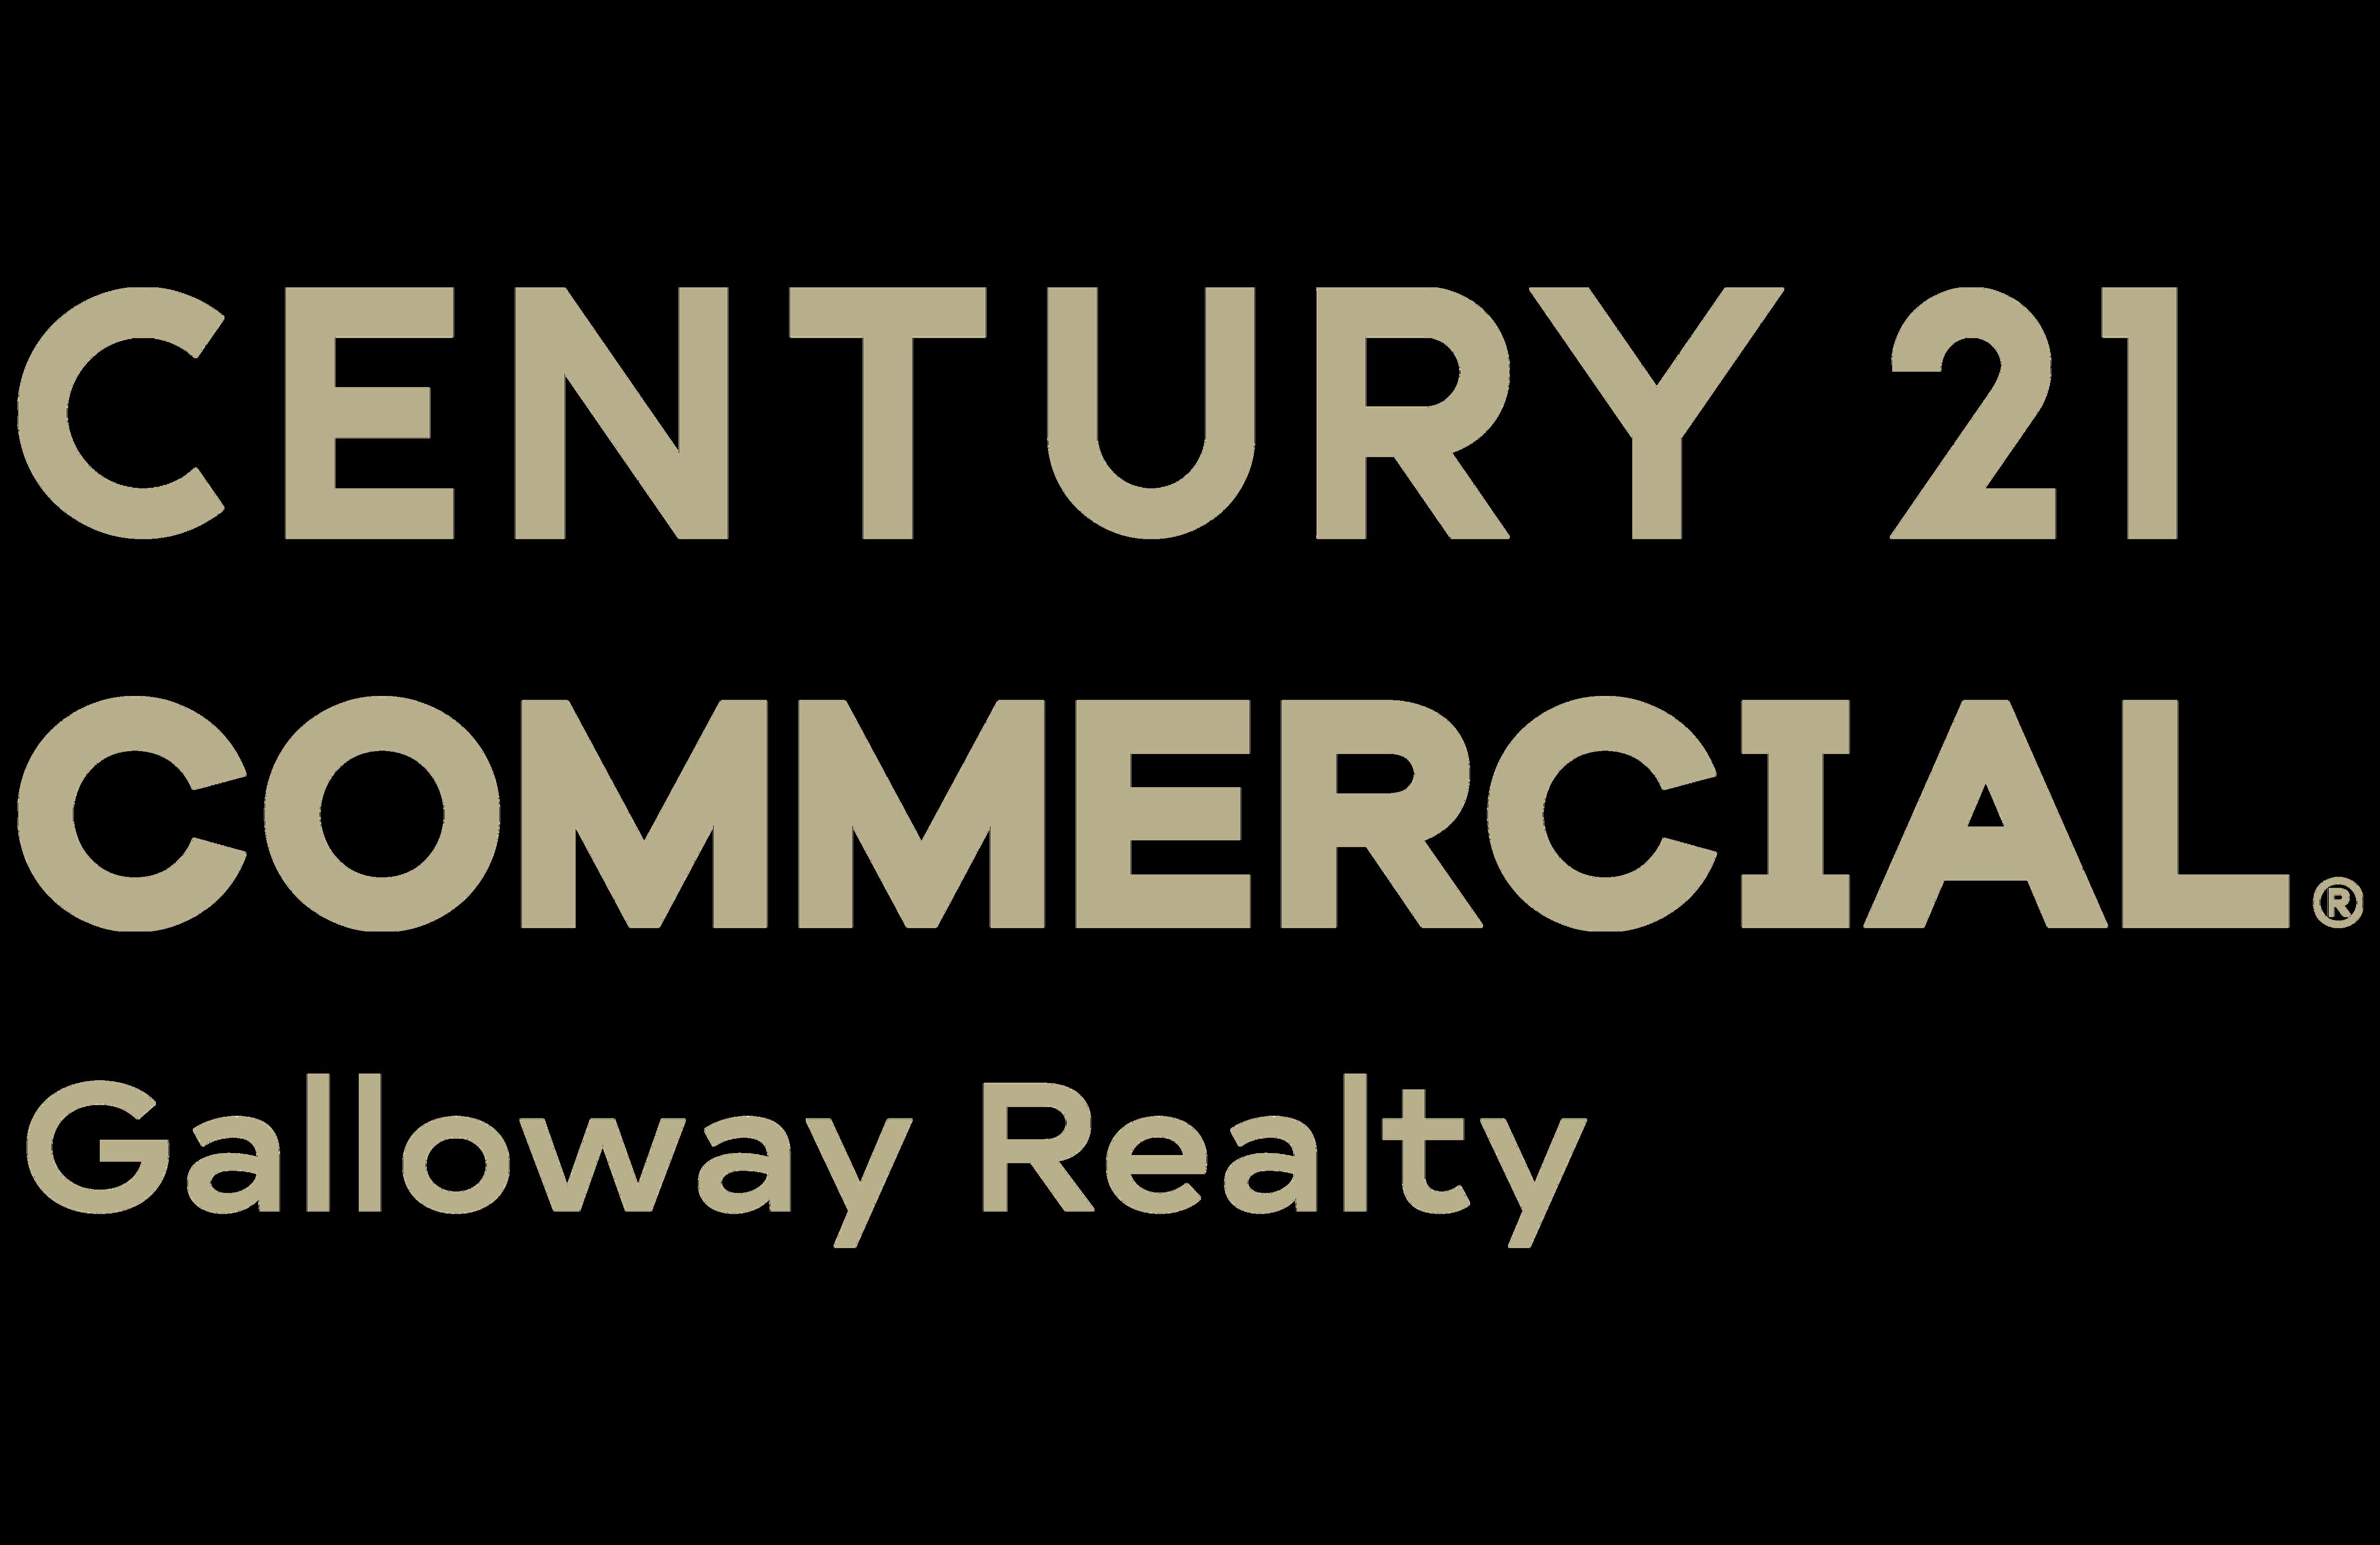 CENTURY 21 Galloway Realty